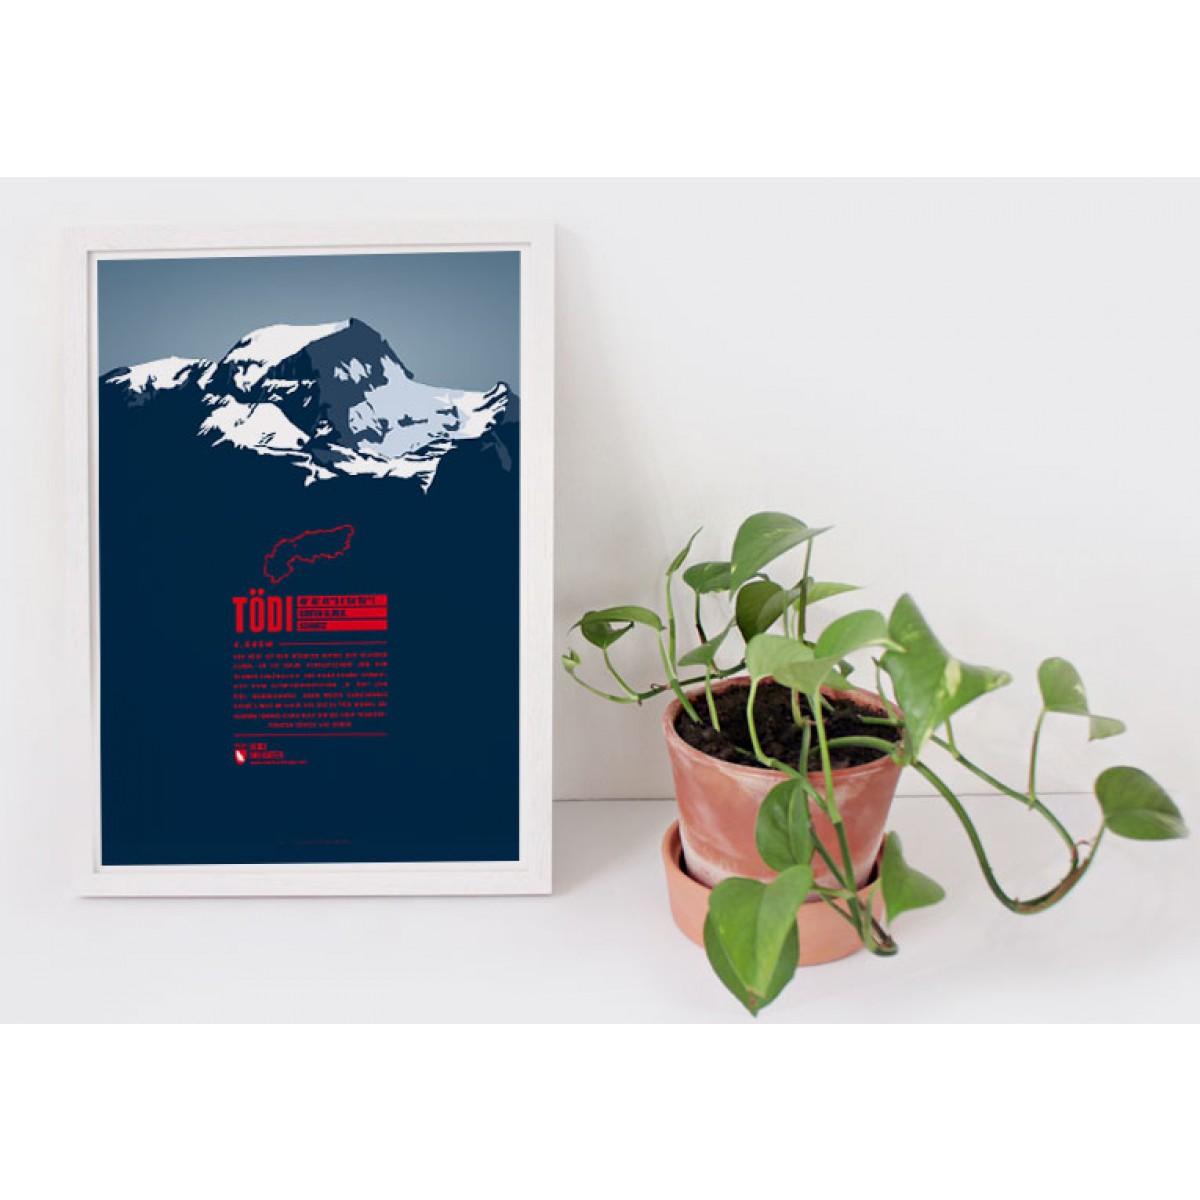 Tödi - Bergdruck